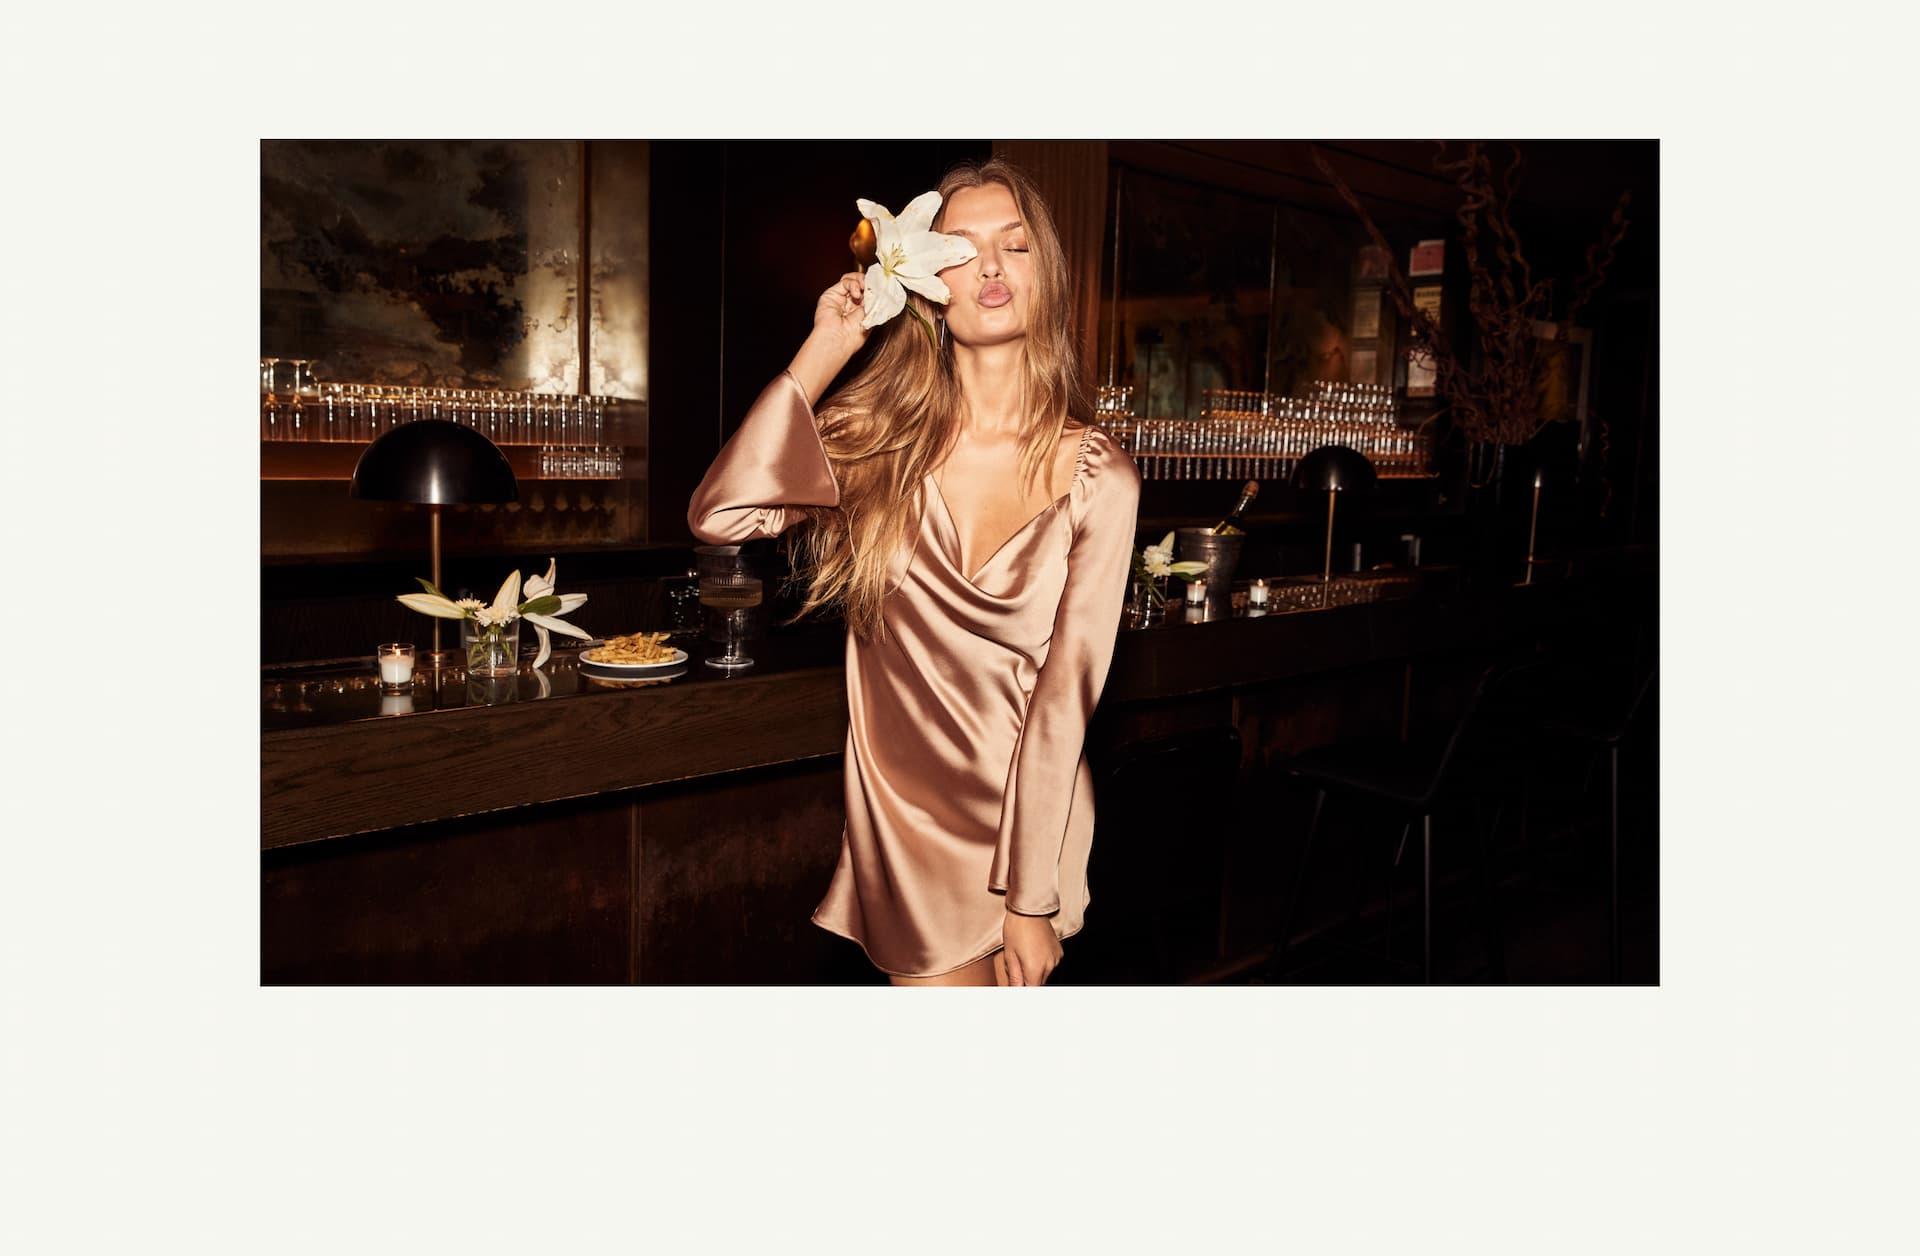 A model wears a long-sleeved pink satin minidress.